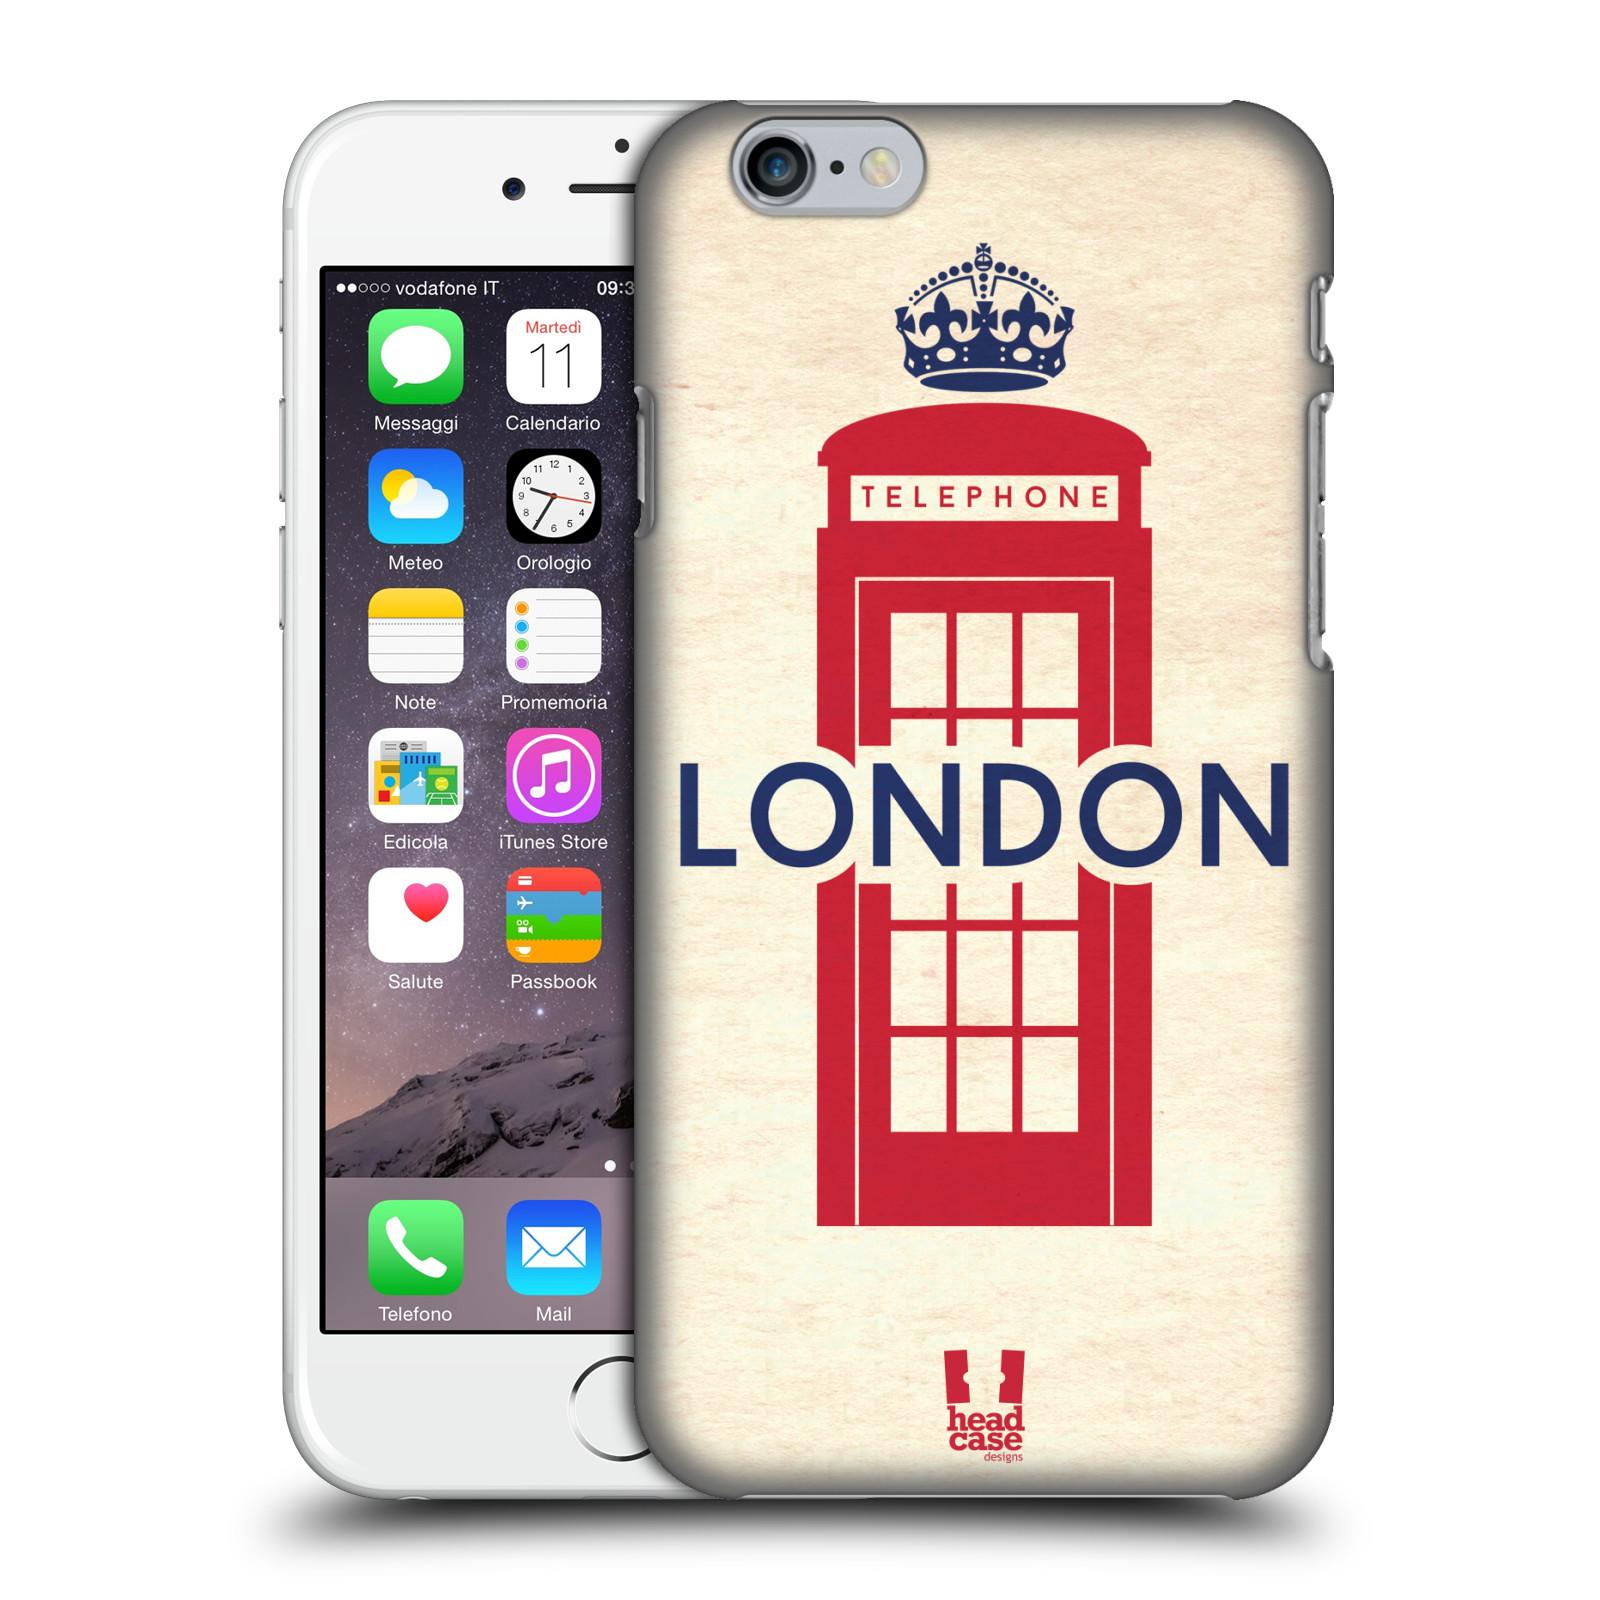 HEAD CASE DESIGNS BRITISH PRIDE HARD BACK CASE FOR APPLE iPHONE 6S